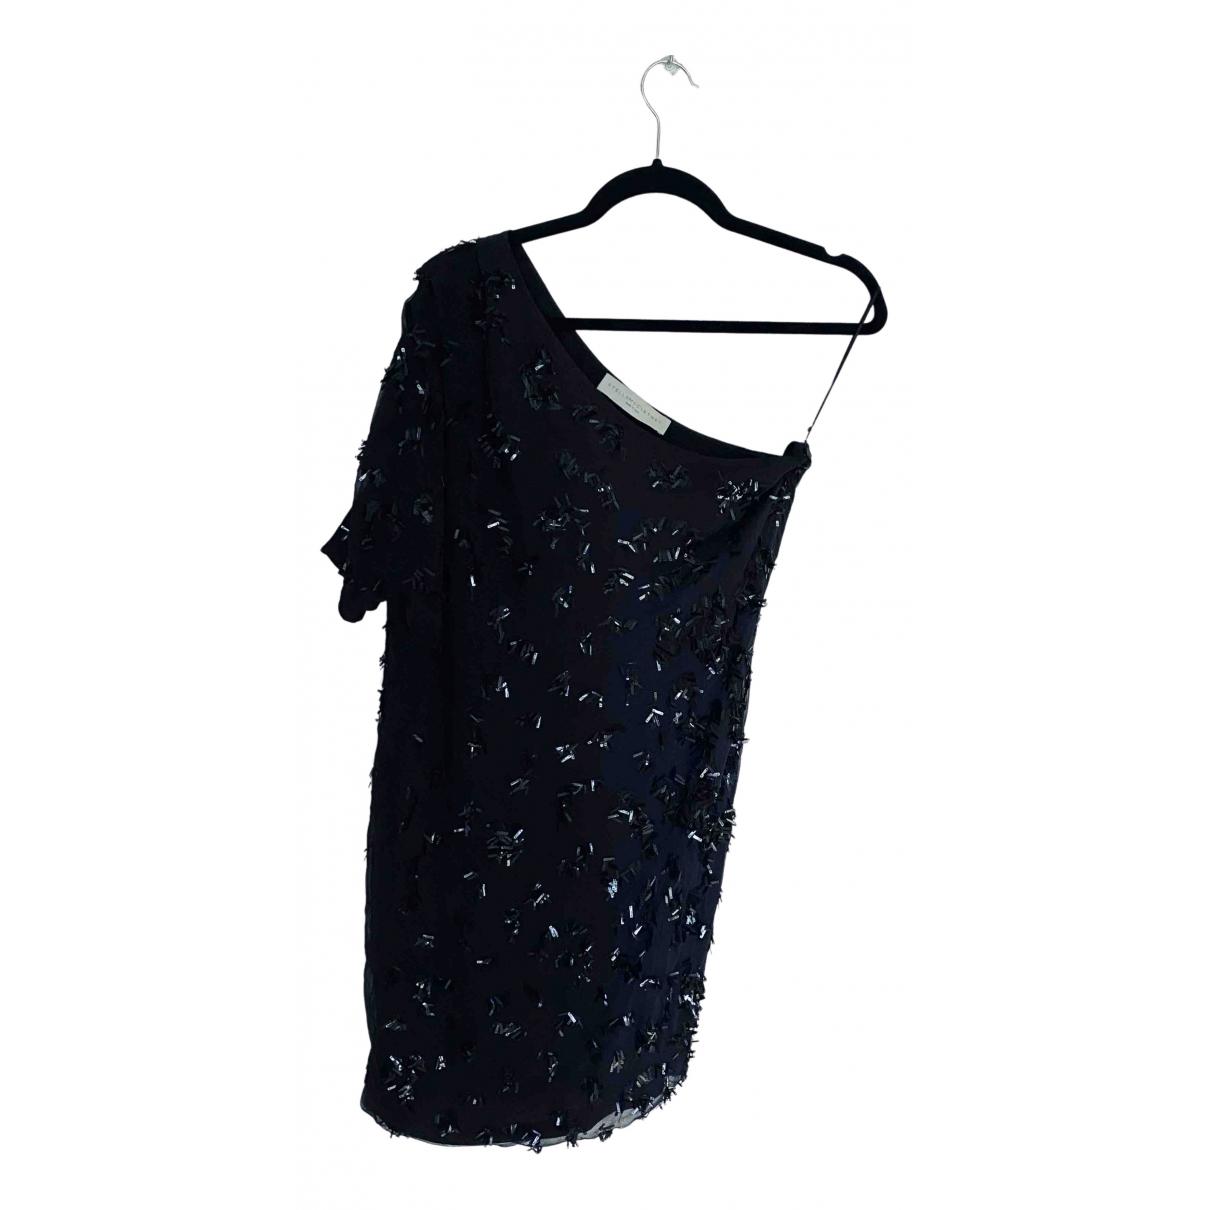 Stella Mccartney \N Kleid in  Anthrazit Viskose